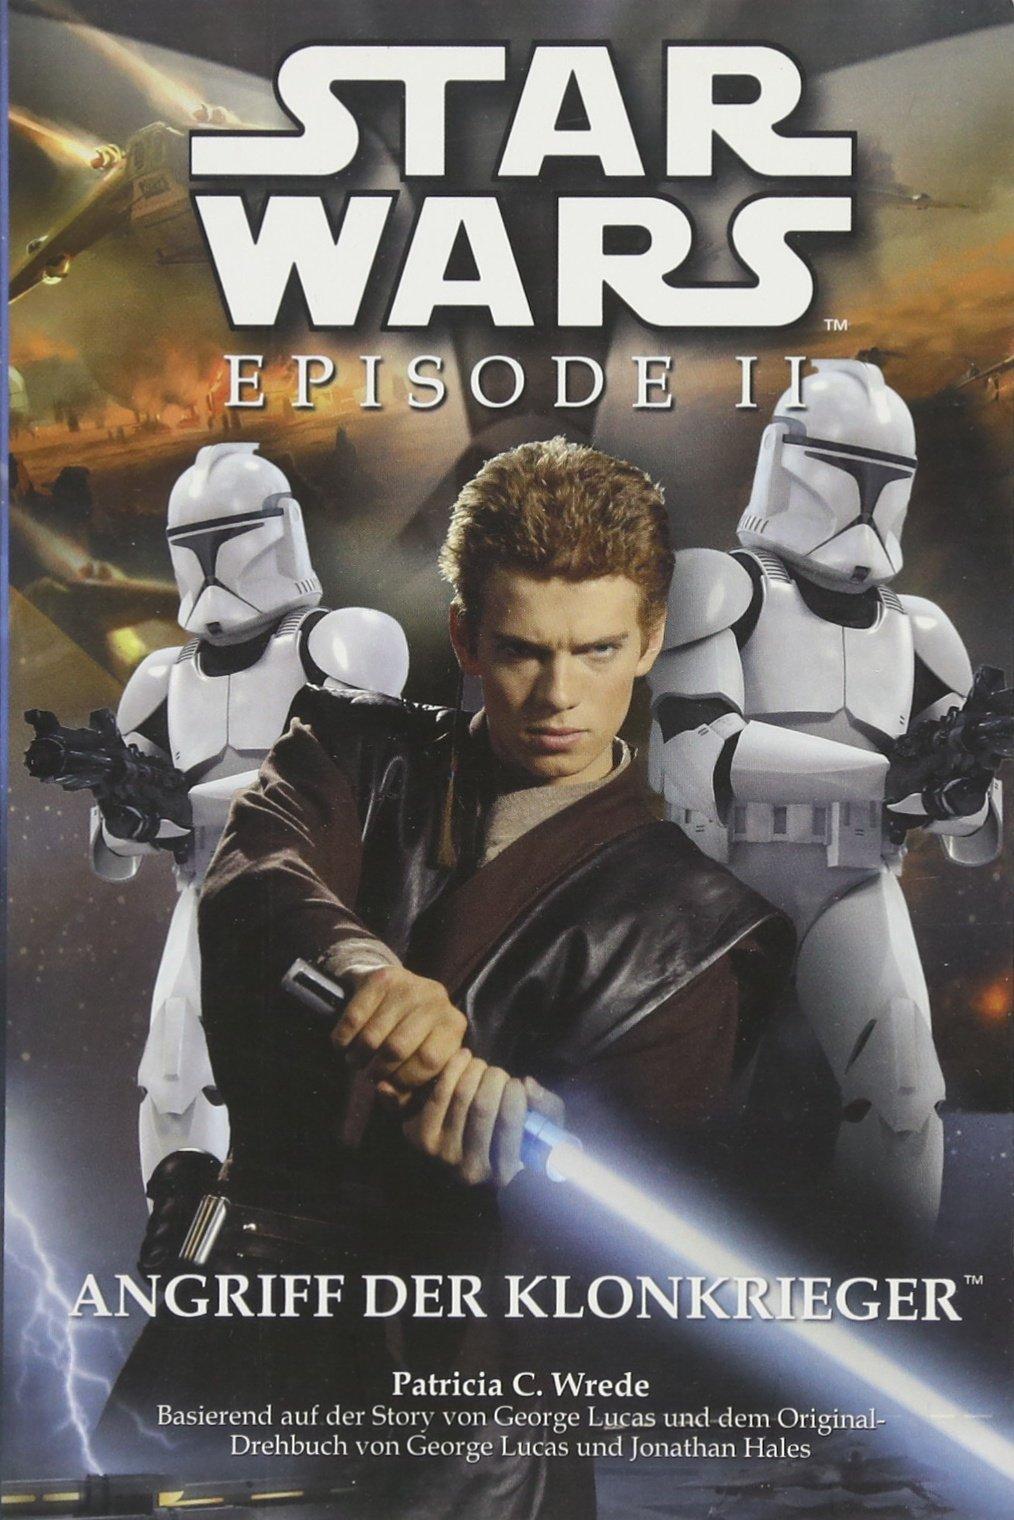 Star Wars: Episode II, Jugendroman zum Film: Angriff der Klonkrieger